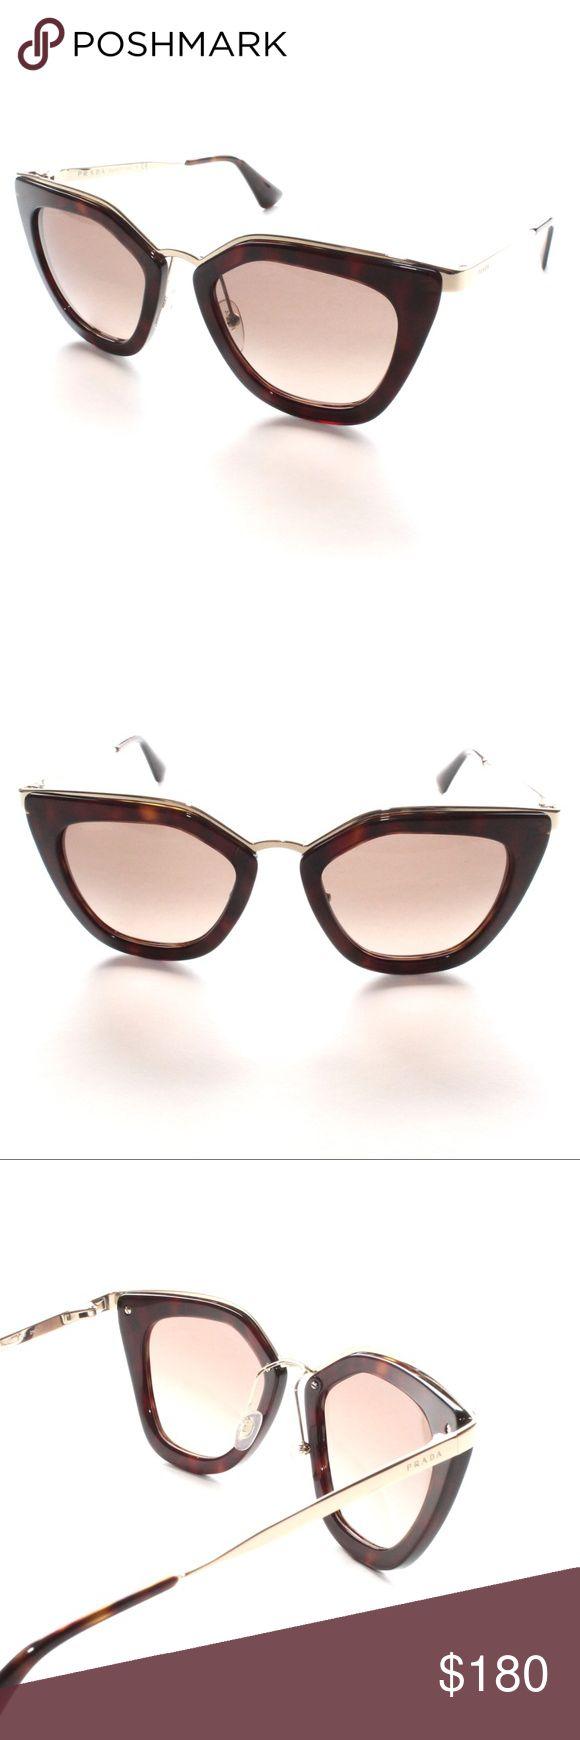 PRADA PR 53S 2AU-3D0 GOLD GRADIENT PR53S SUNGLASSE Brand New 100% AUTHENTIC PRADA PR 53S 2AU-3D0 GOLD GRADIENT PR53S SUNGLASSES 52-21  Comes with Original Prada Case, NO Pouch Prada Accessories Sunglasses